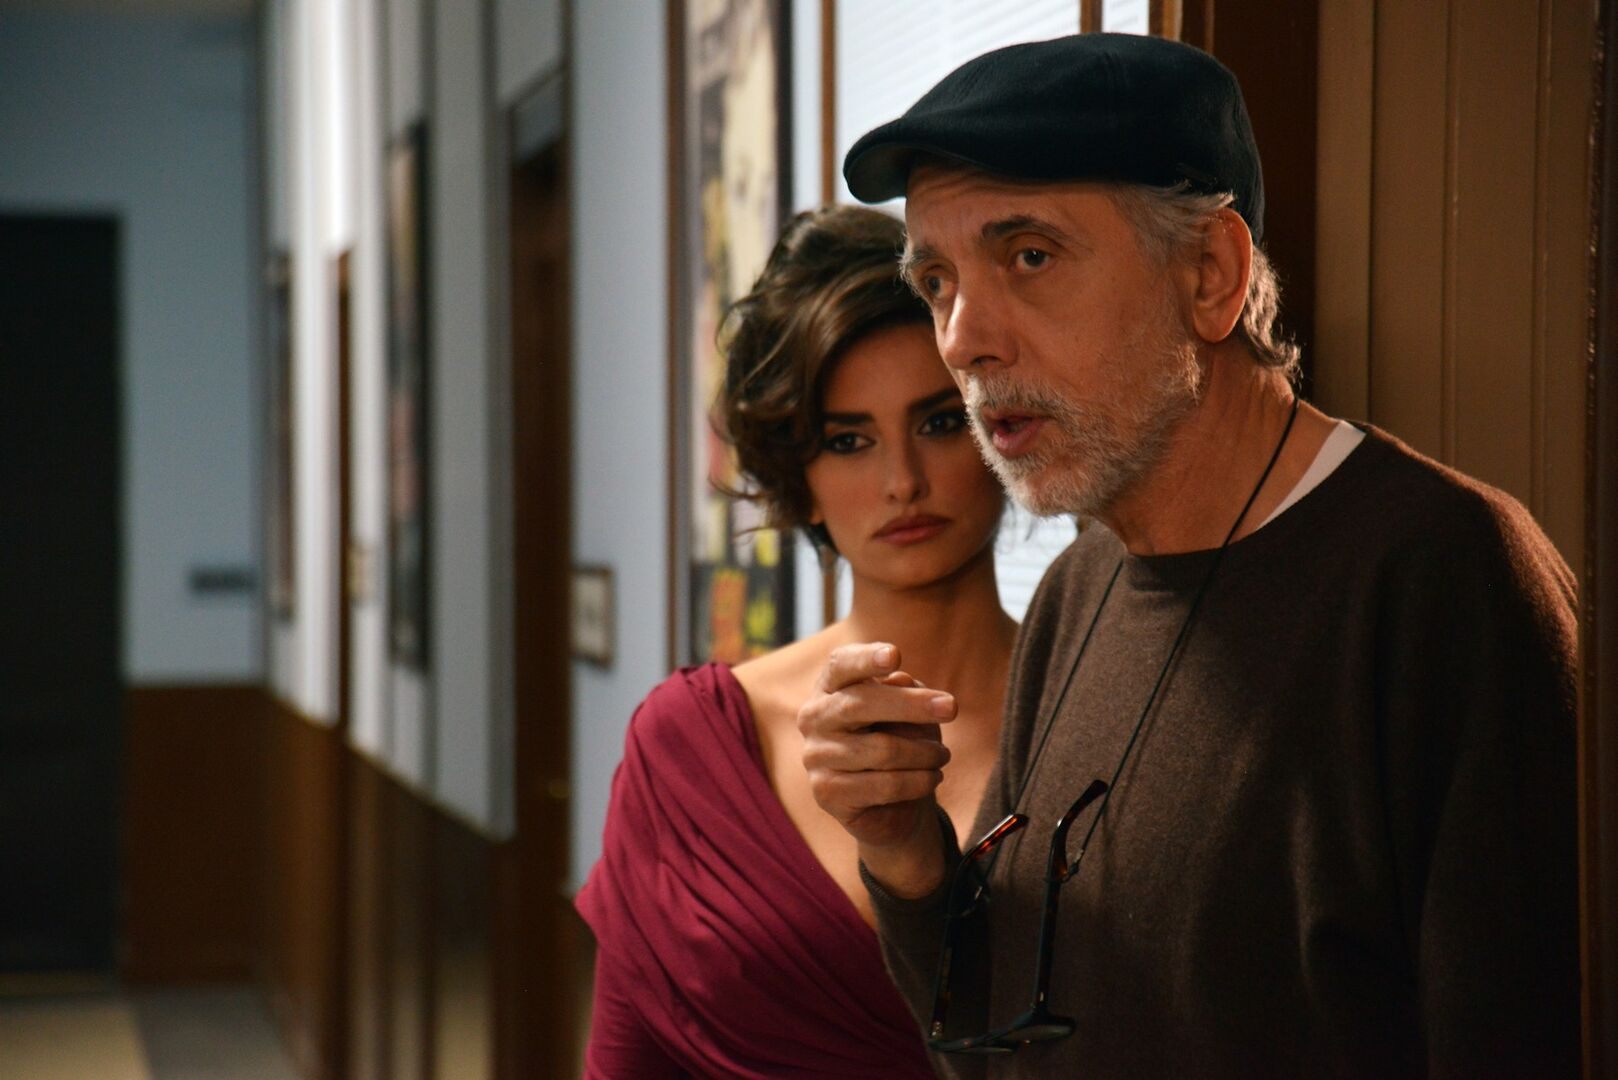 Fernando Trueba se estrella en taquilla con 'La reina de España' - Libertad  Digital - Cultura